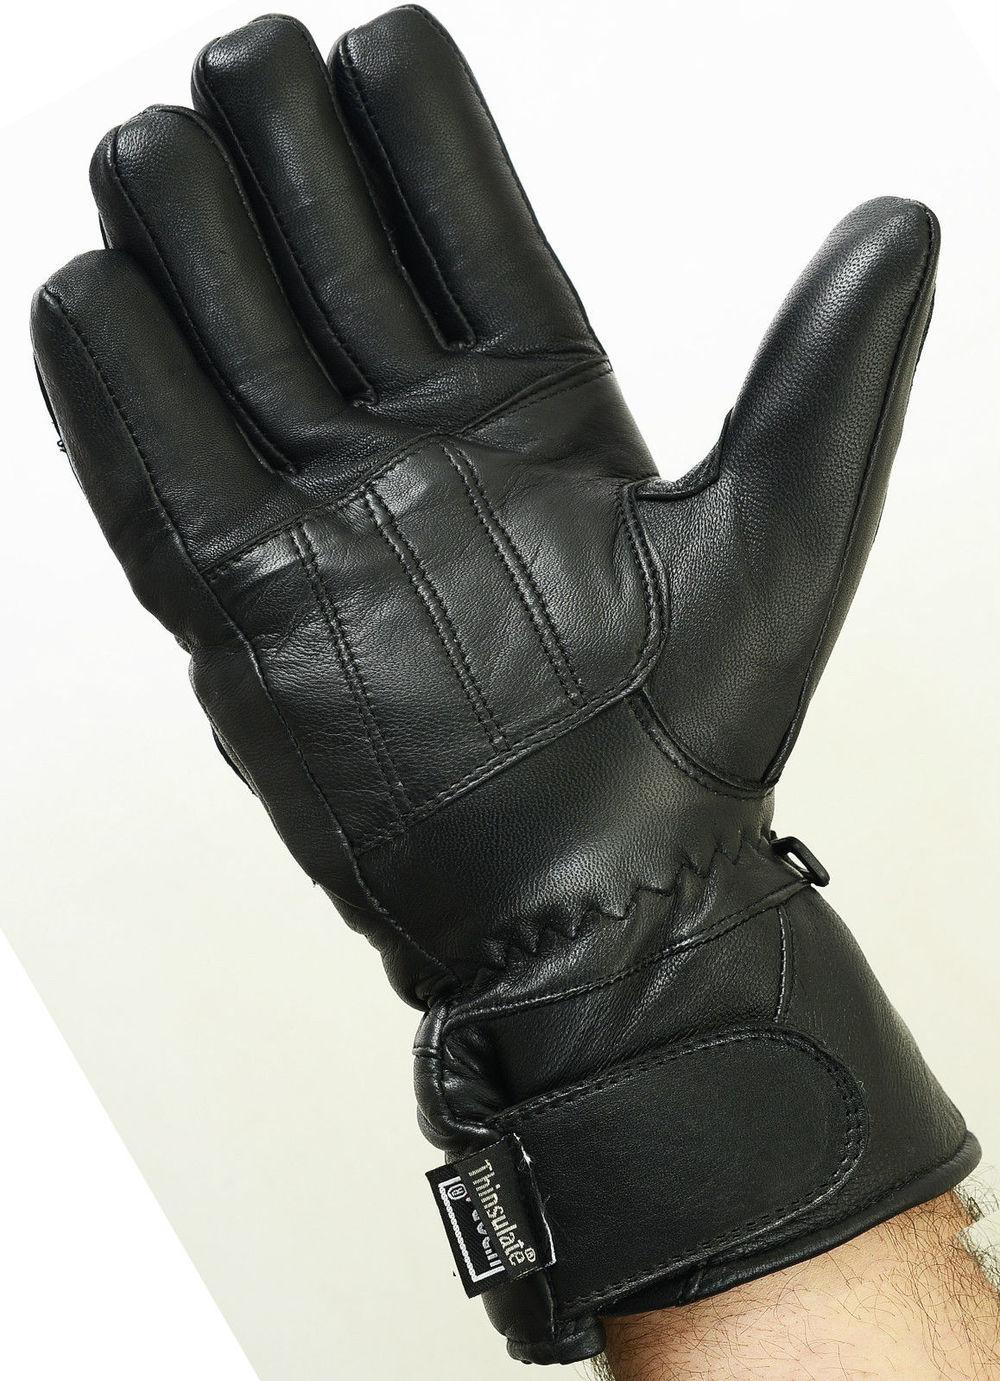 Padded Leather Motorbike Gloves Thermal Waterproof